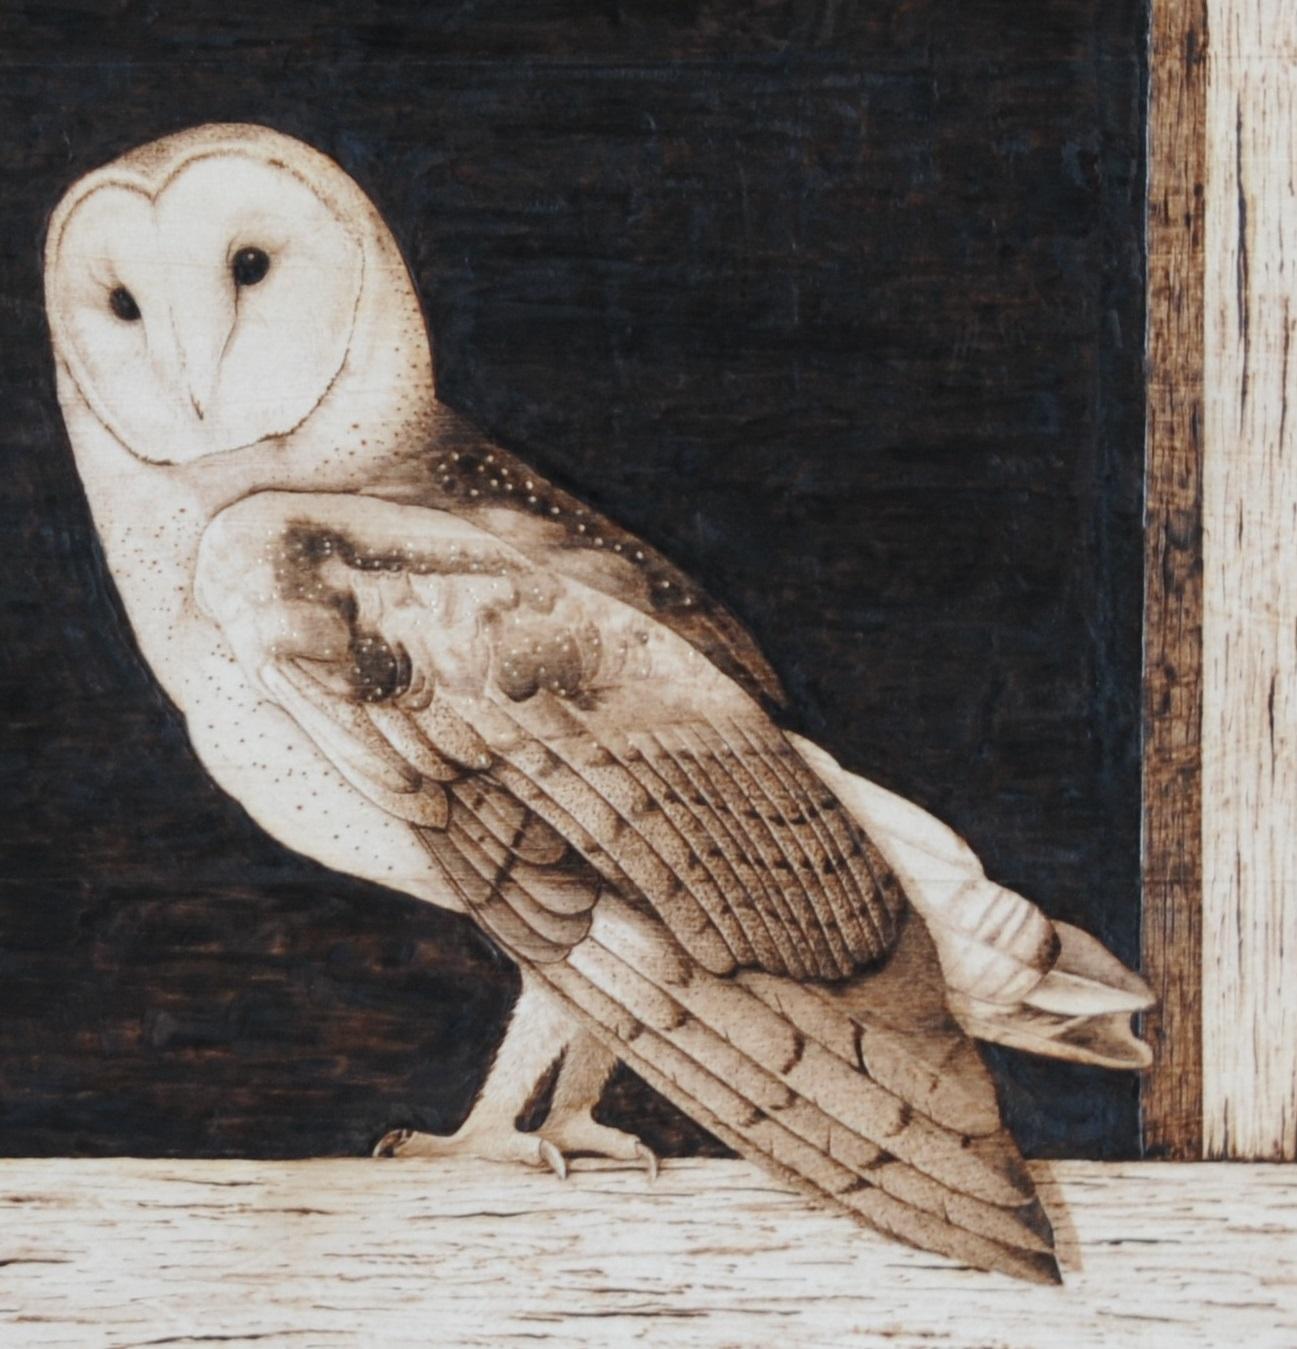 The Barn Owl Pyrography Wood Burning